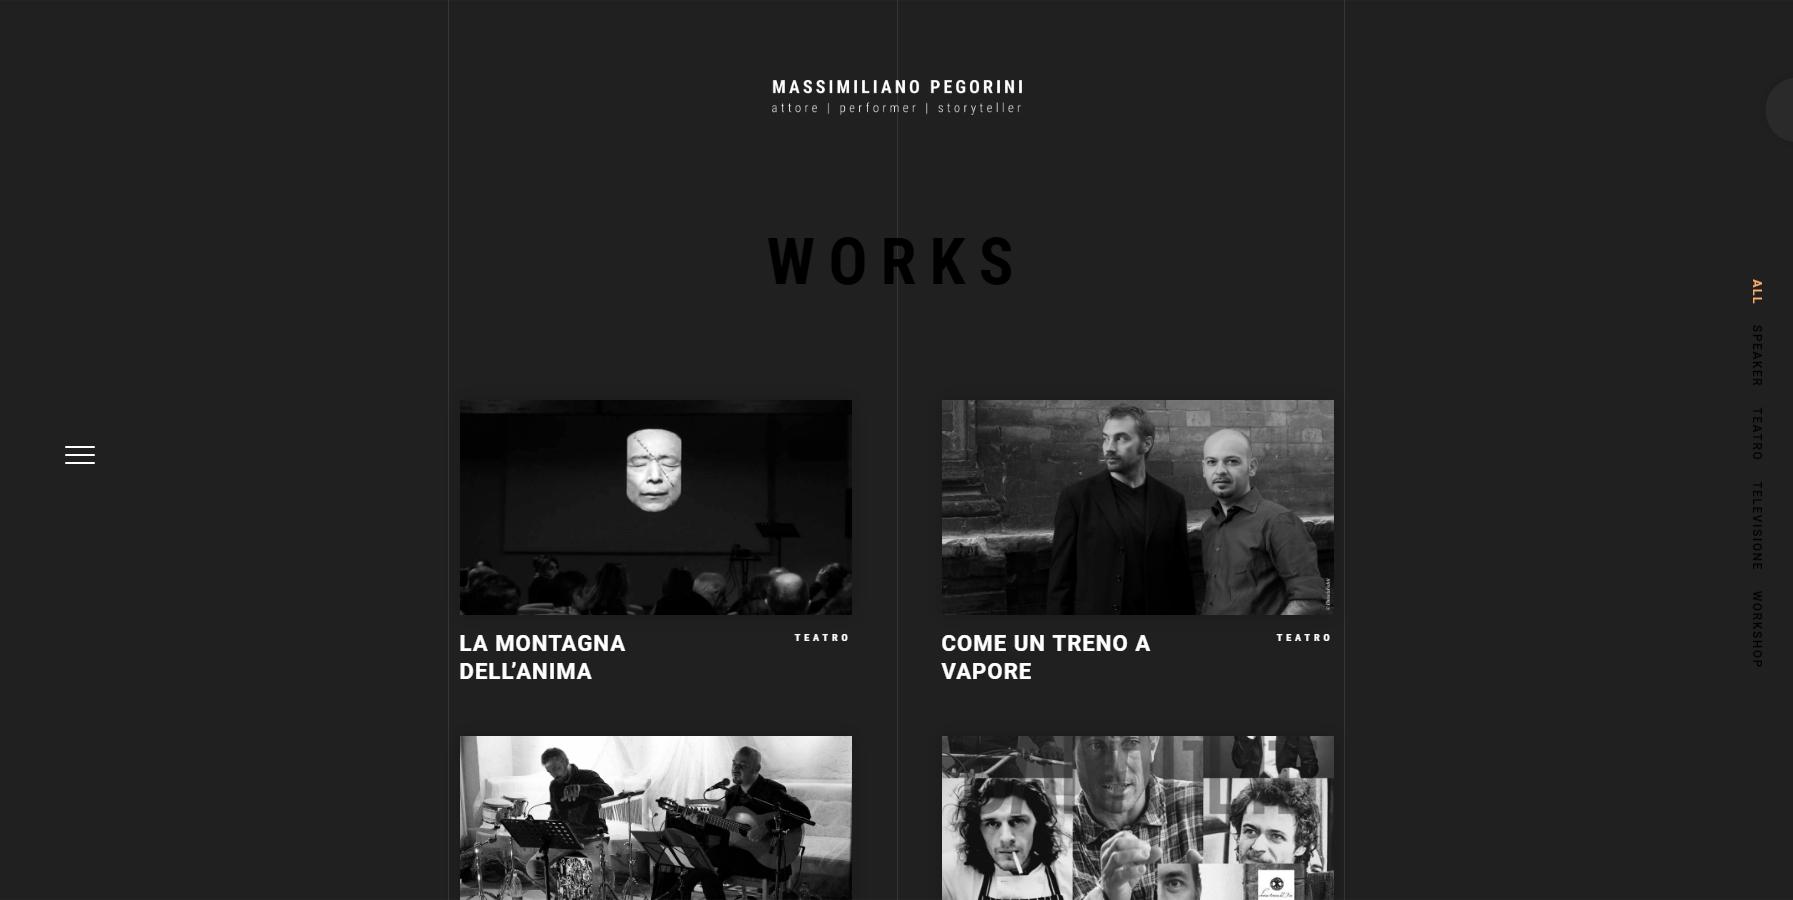 Massimiliano Pegorini - Website of the Day